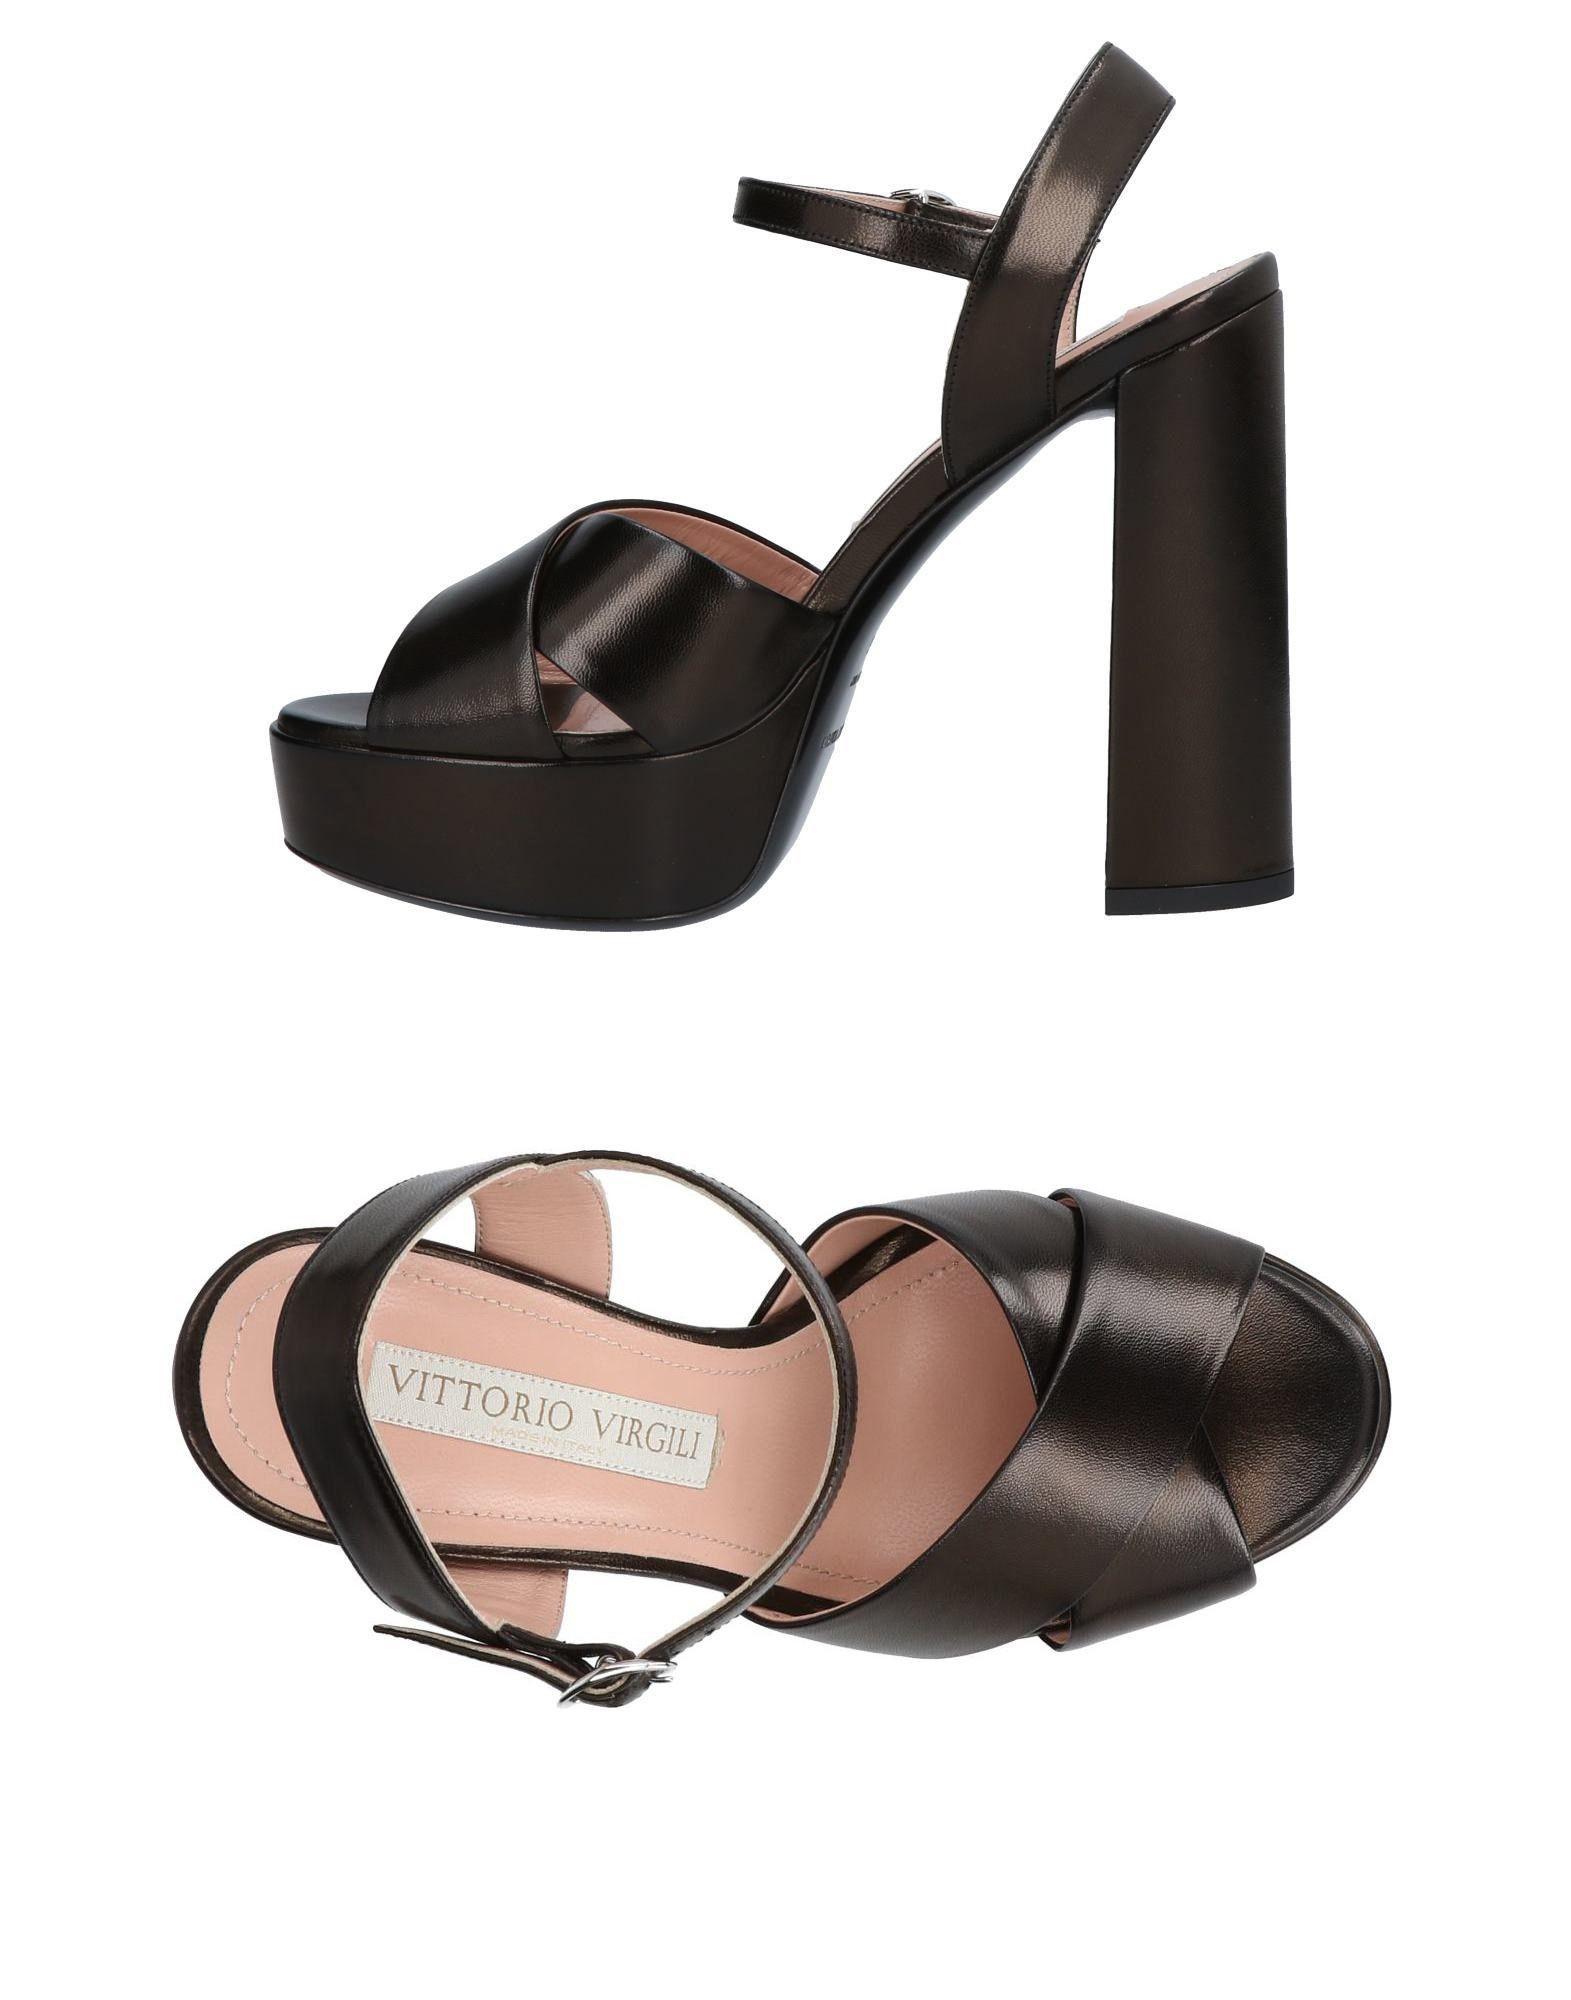 VITTORIO VIRGILI Sandals - Footwear | YOOX COM